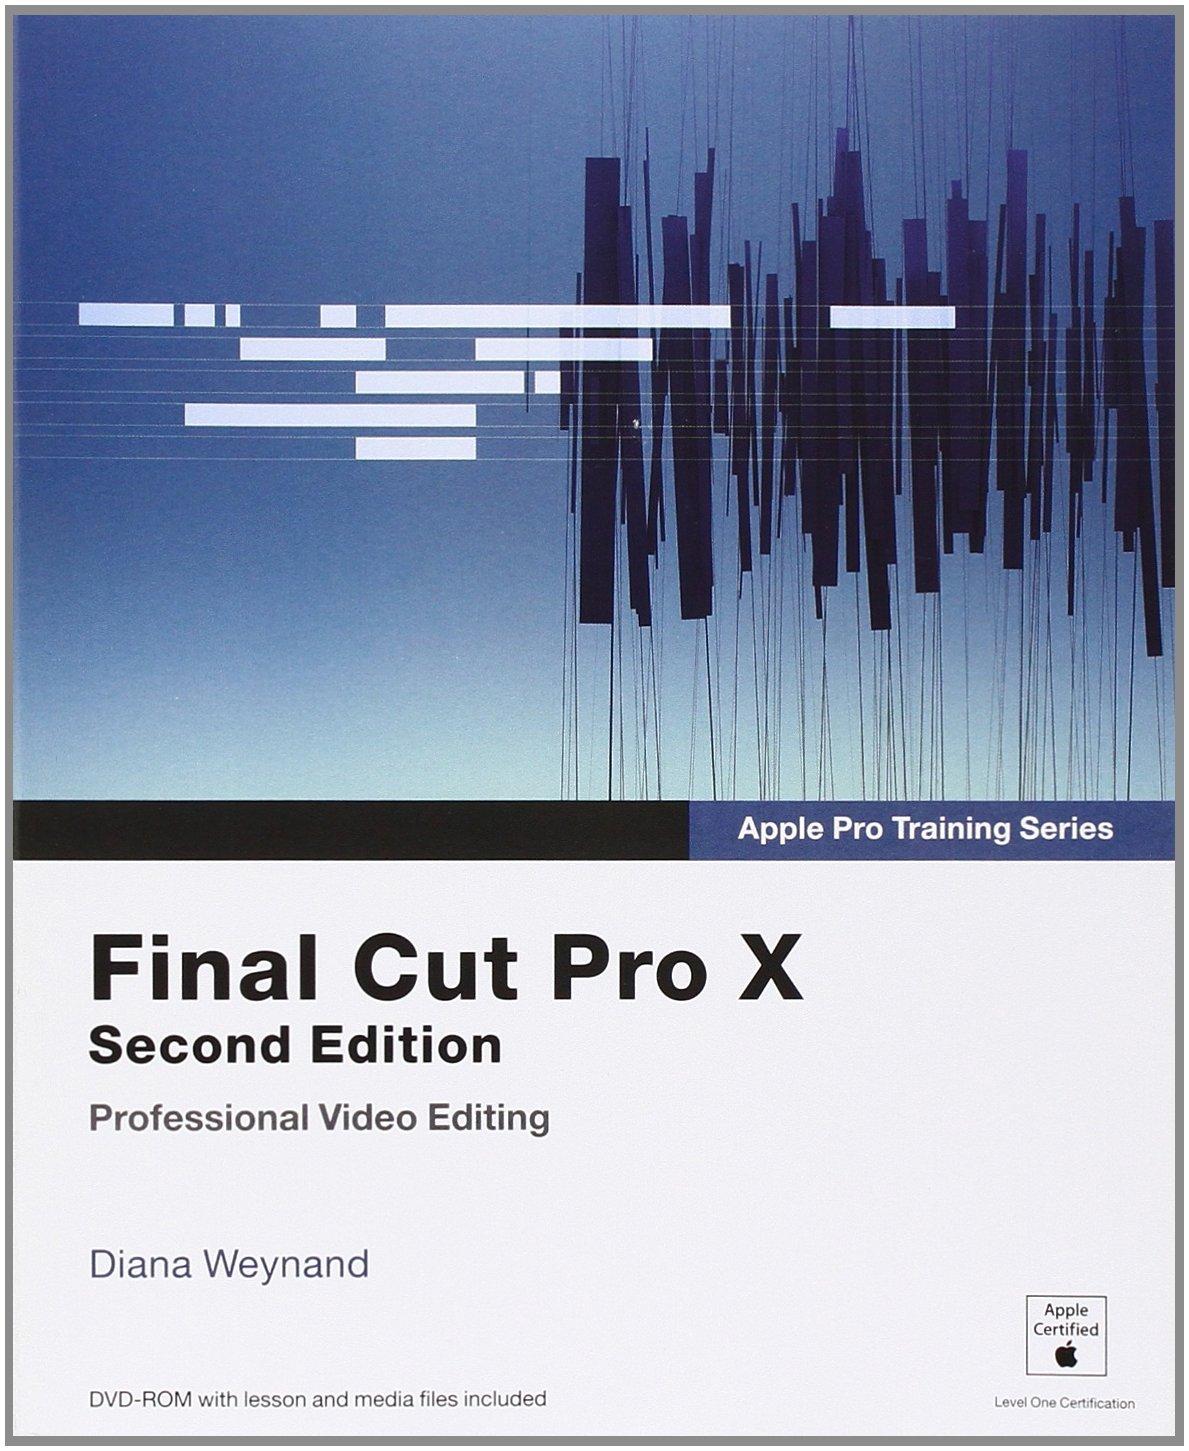 Amazon Apple Pro Training Series Final Cut Pro X Diana